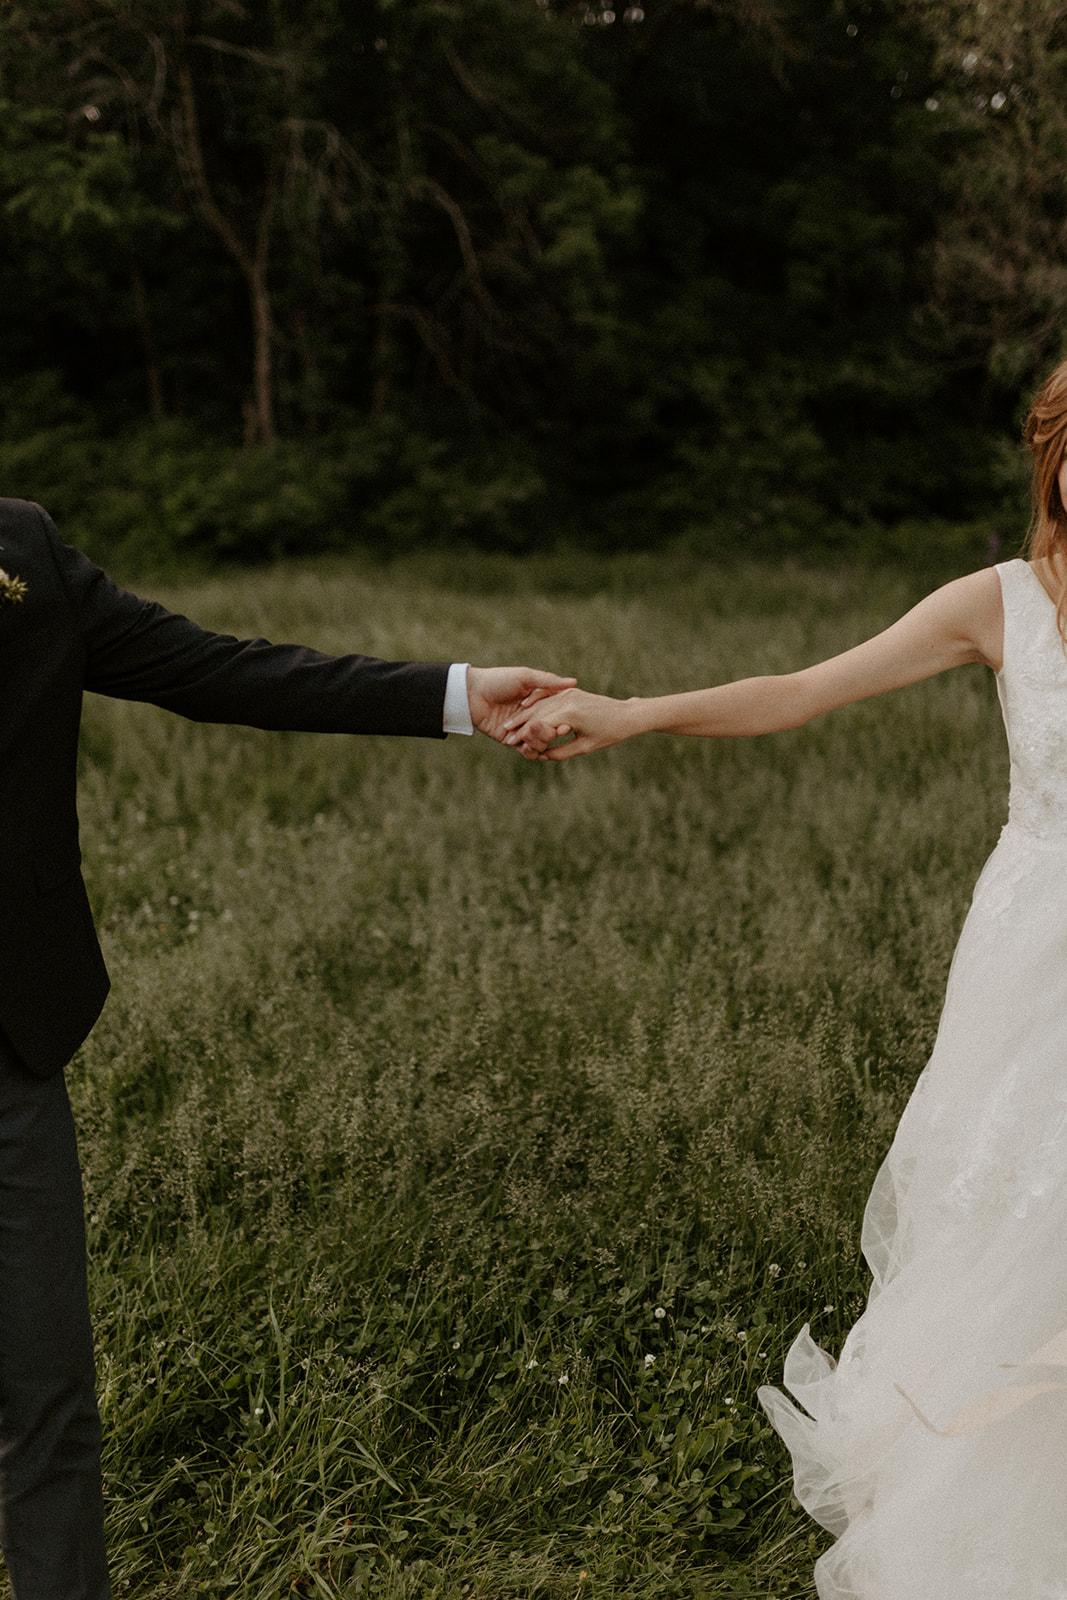 camp_wokanda_peoria_illinois_wedding_photographer_wright_photographs_bliese_0785.jpg